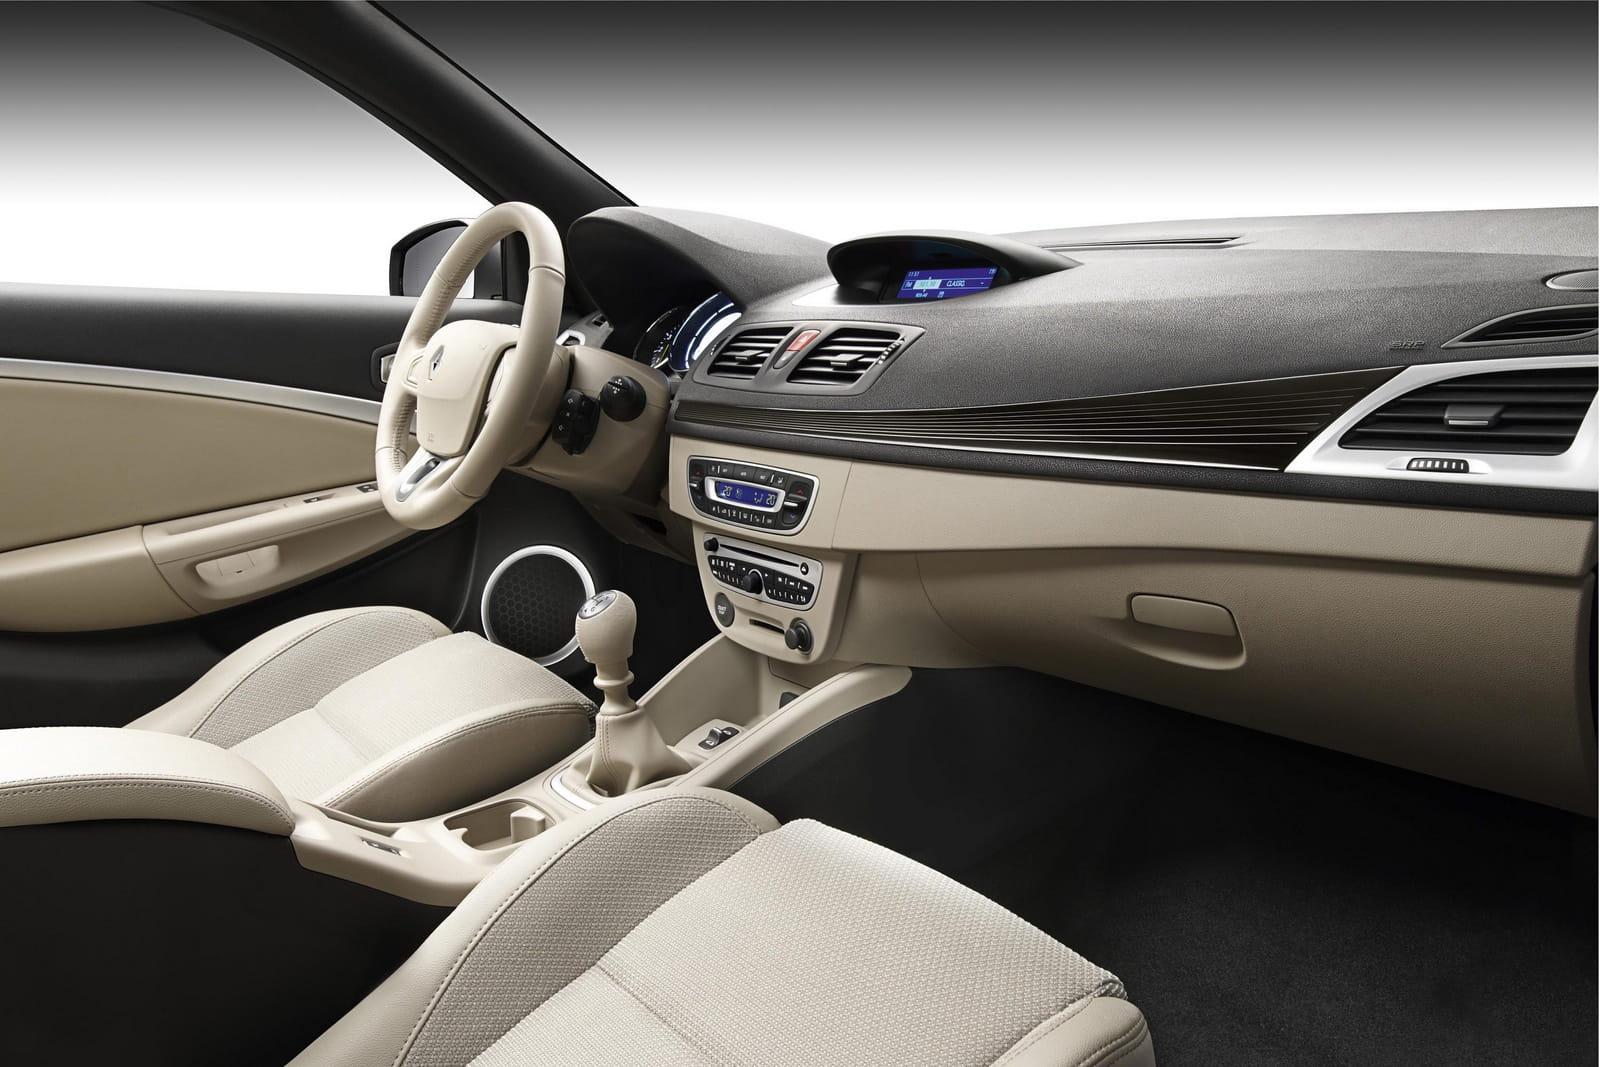 Renault Megane Cc Coupe Cabriolet Diariomotor